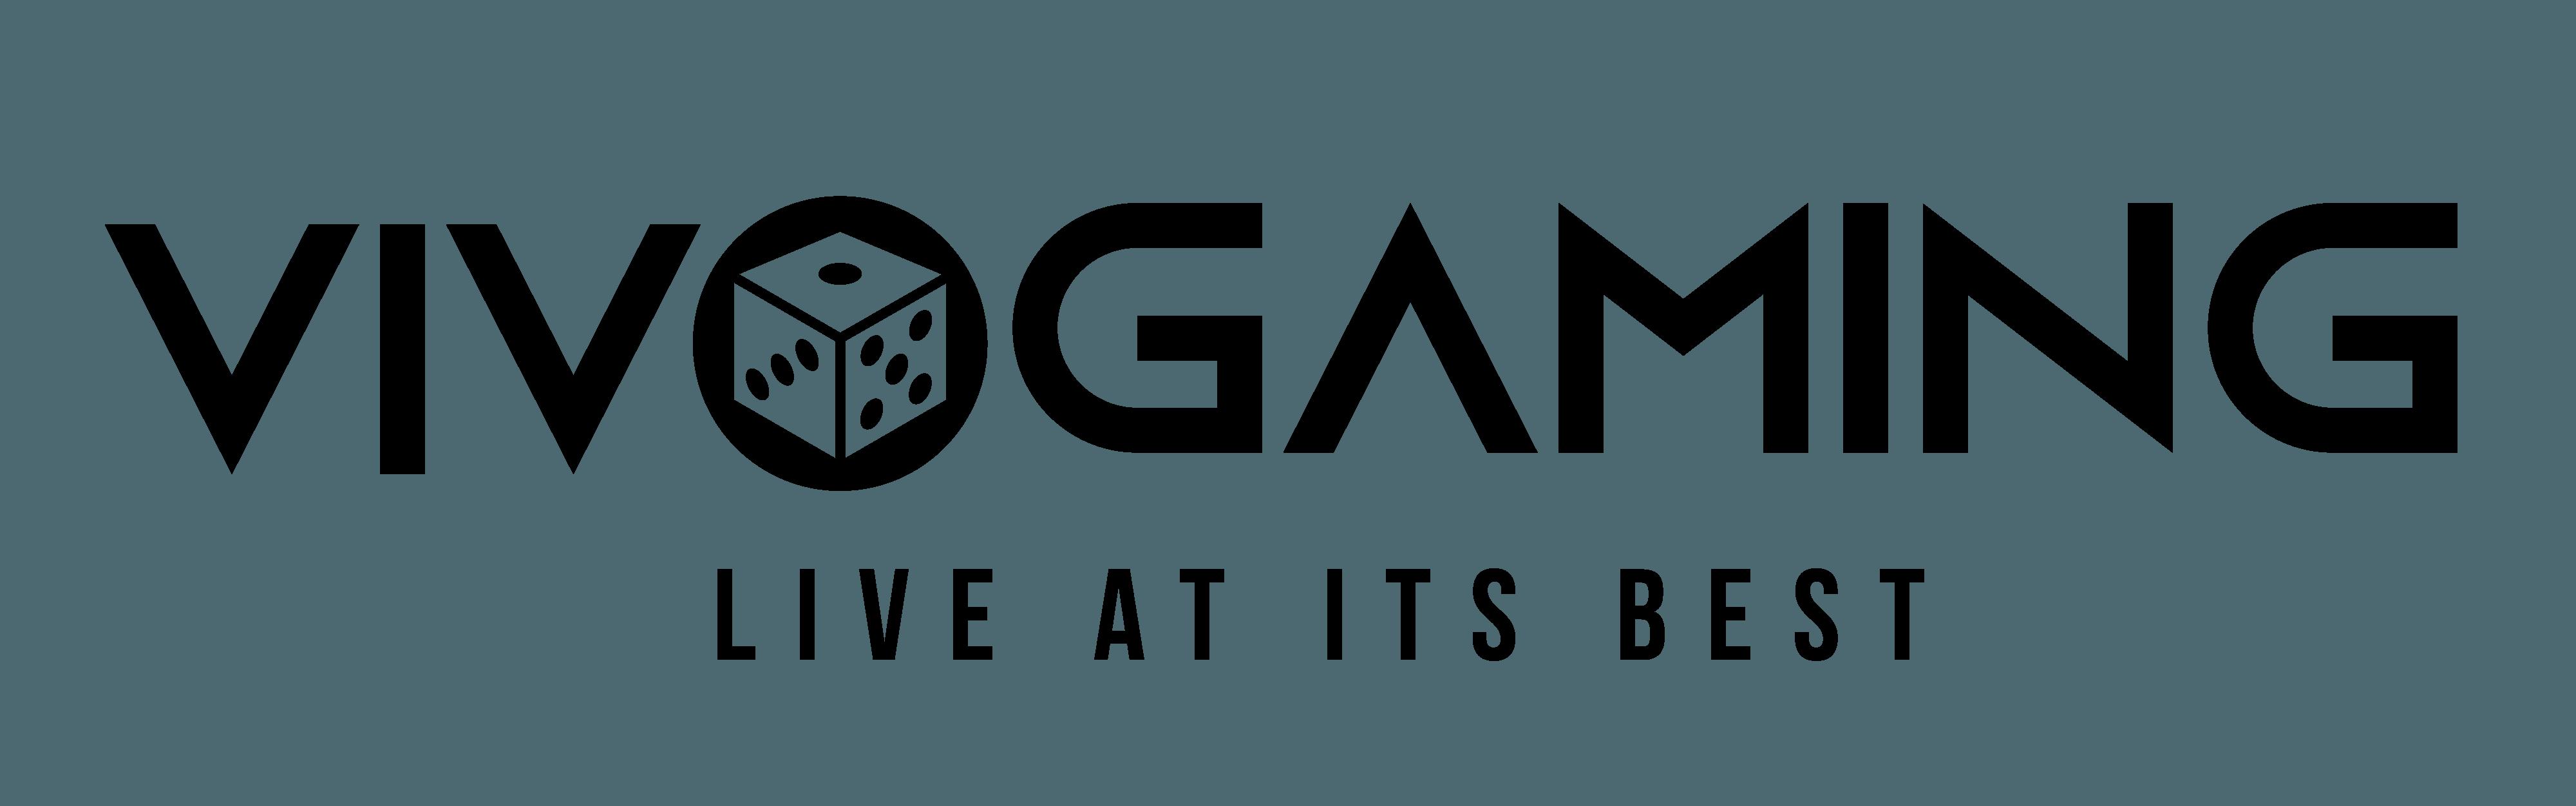 Vivo Gaming